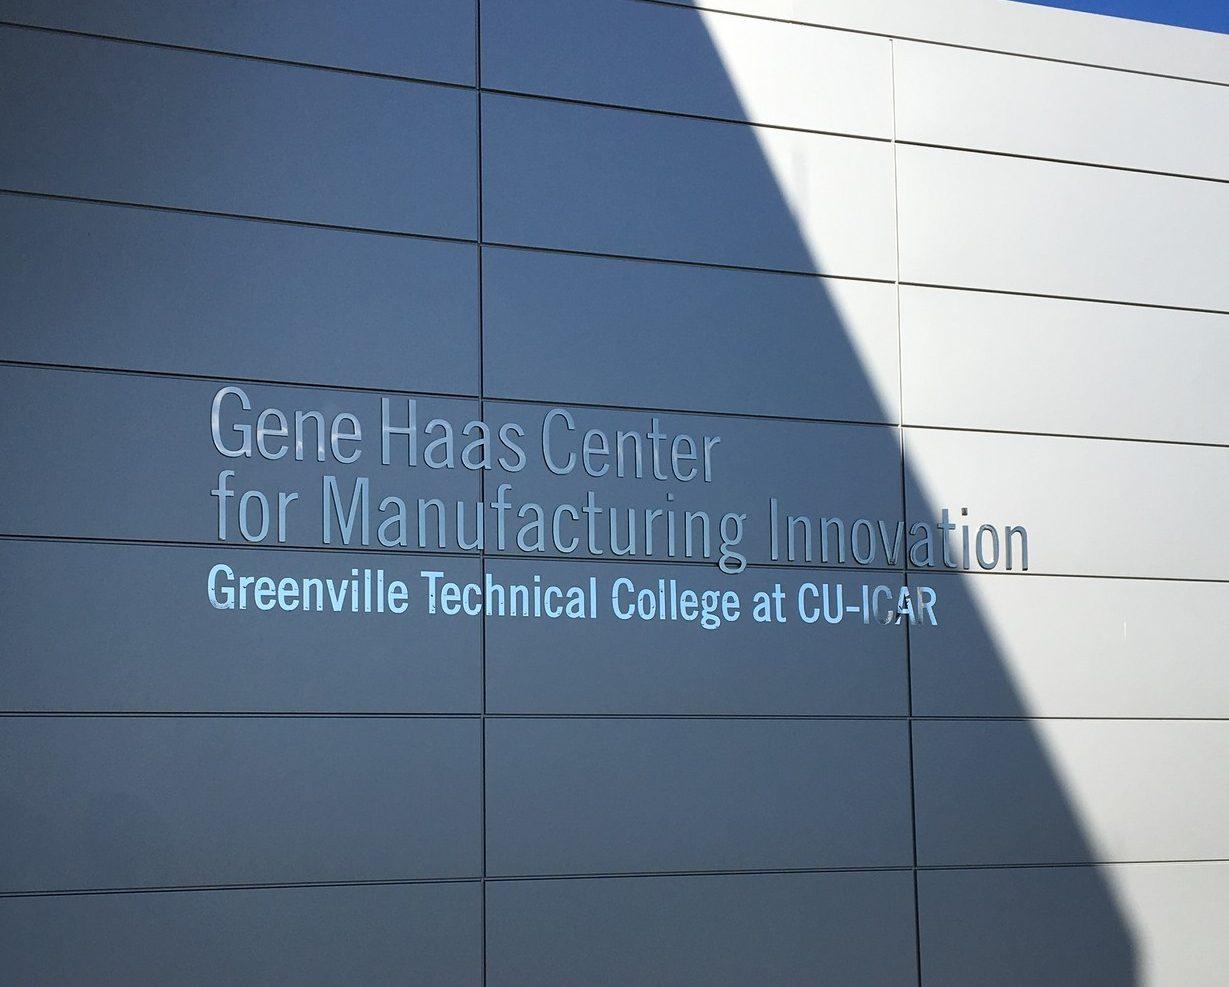 Gene Haas Center